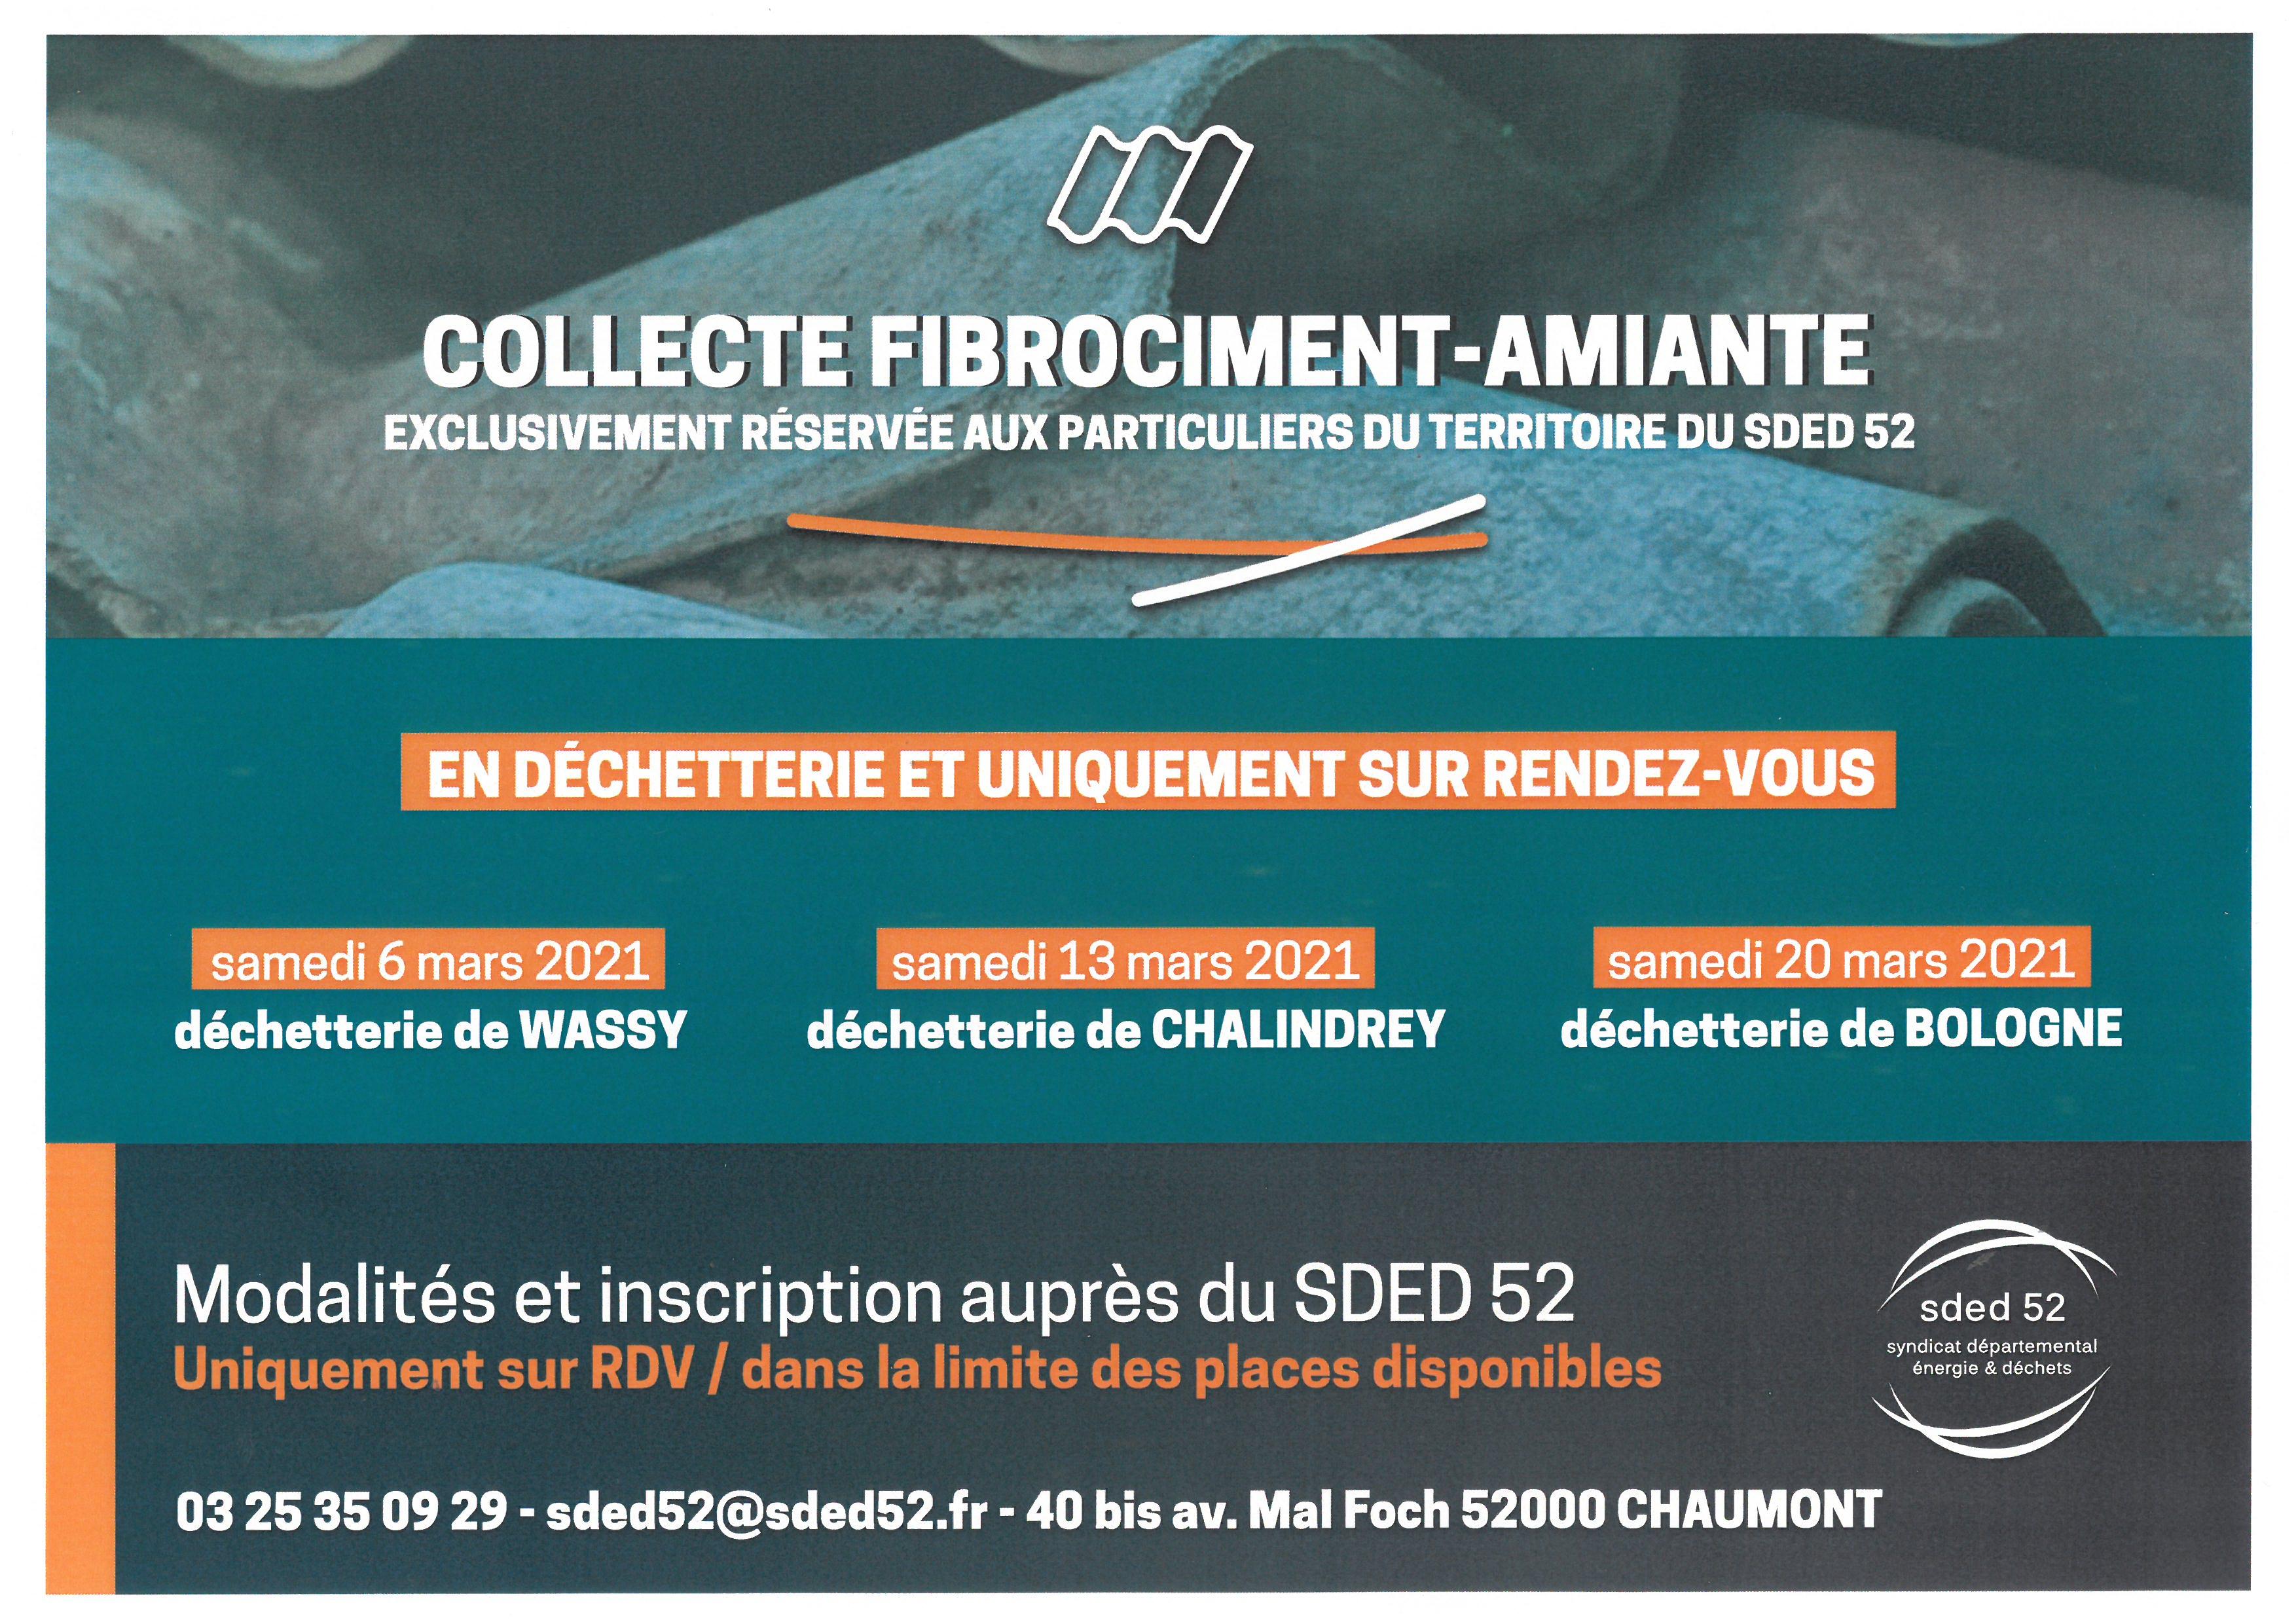 COLLECTE FIBROCIMENT-AMIANTE